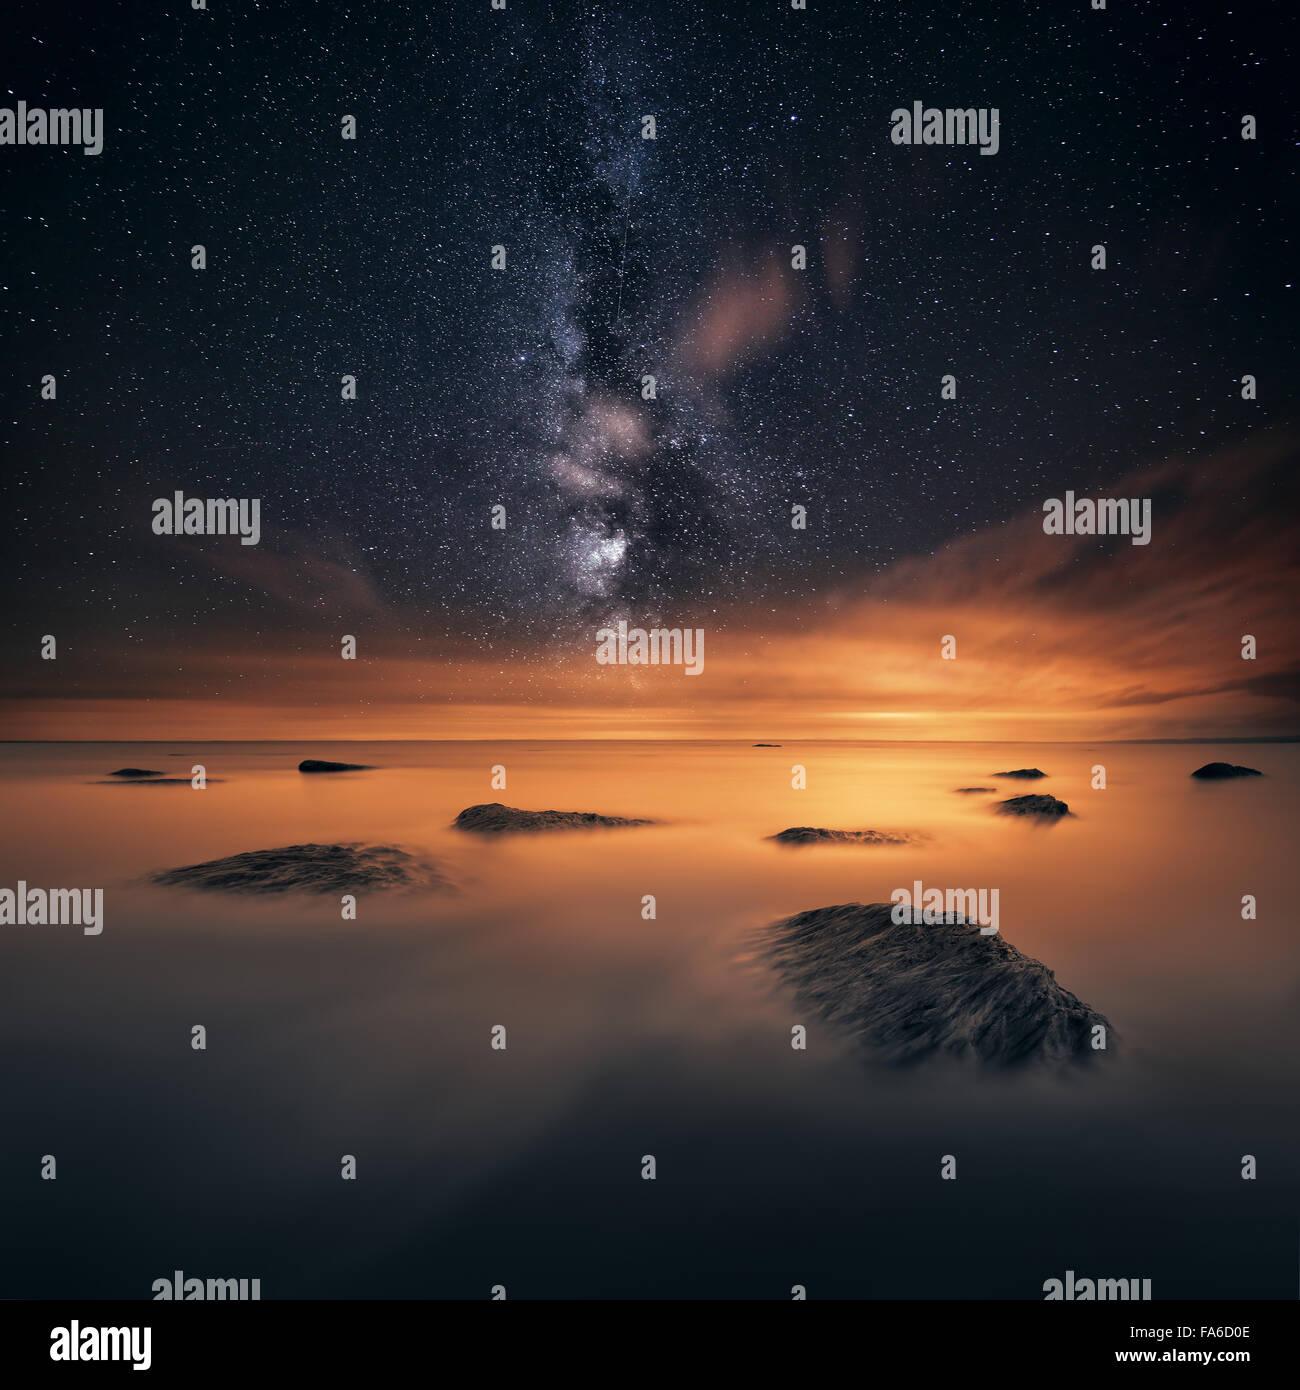 Stars at night, Lough Neagh, Northern Ireland, UK - Stock Image